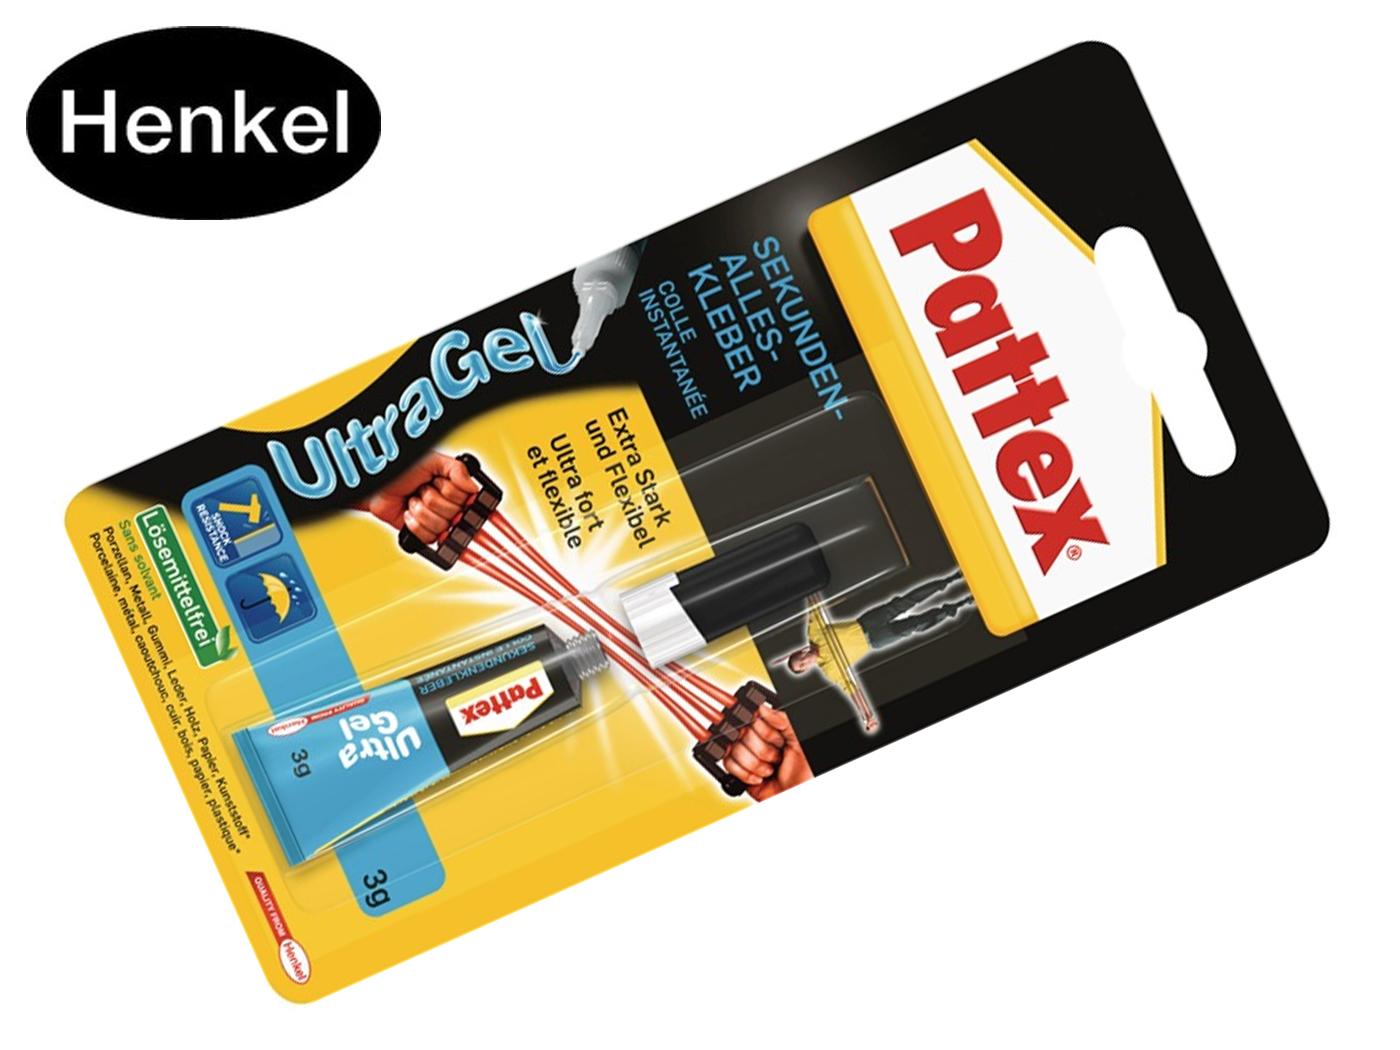 Henkel Superglue Ultra Gel kleurloos | DKMTools - DKM Tools